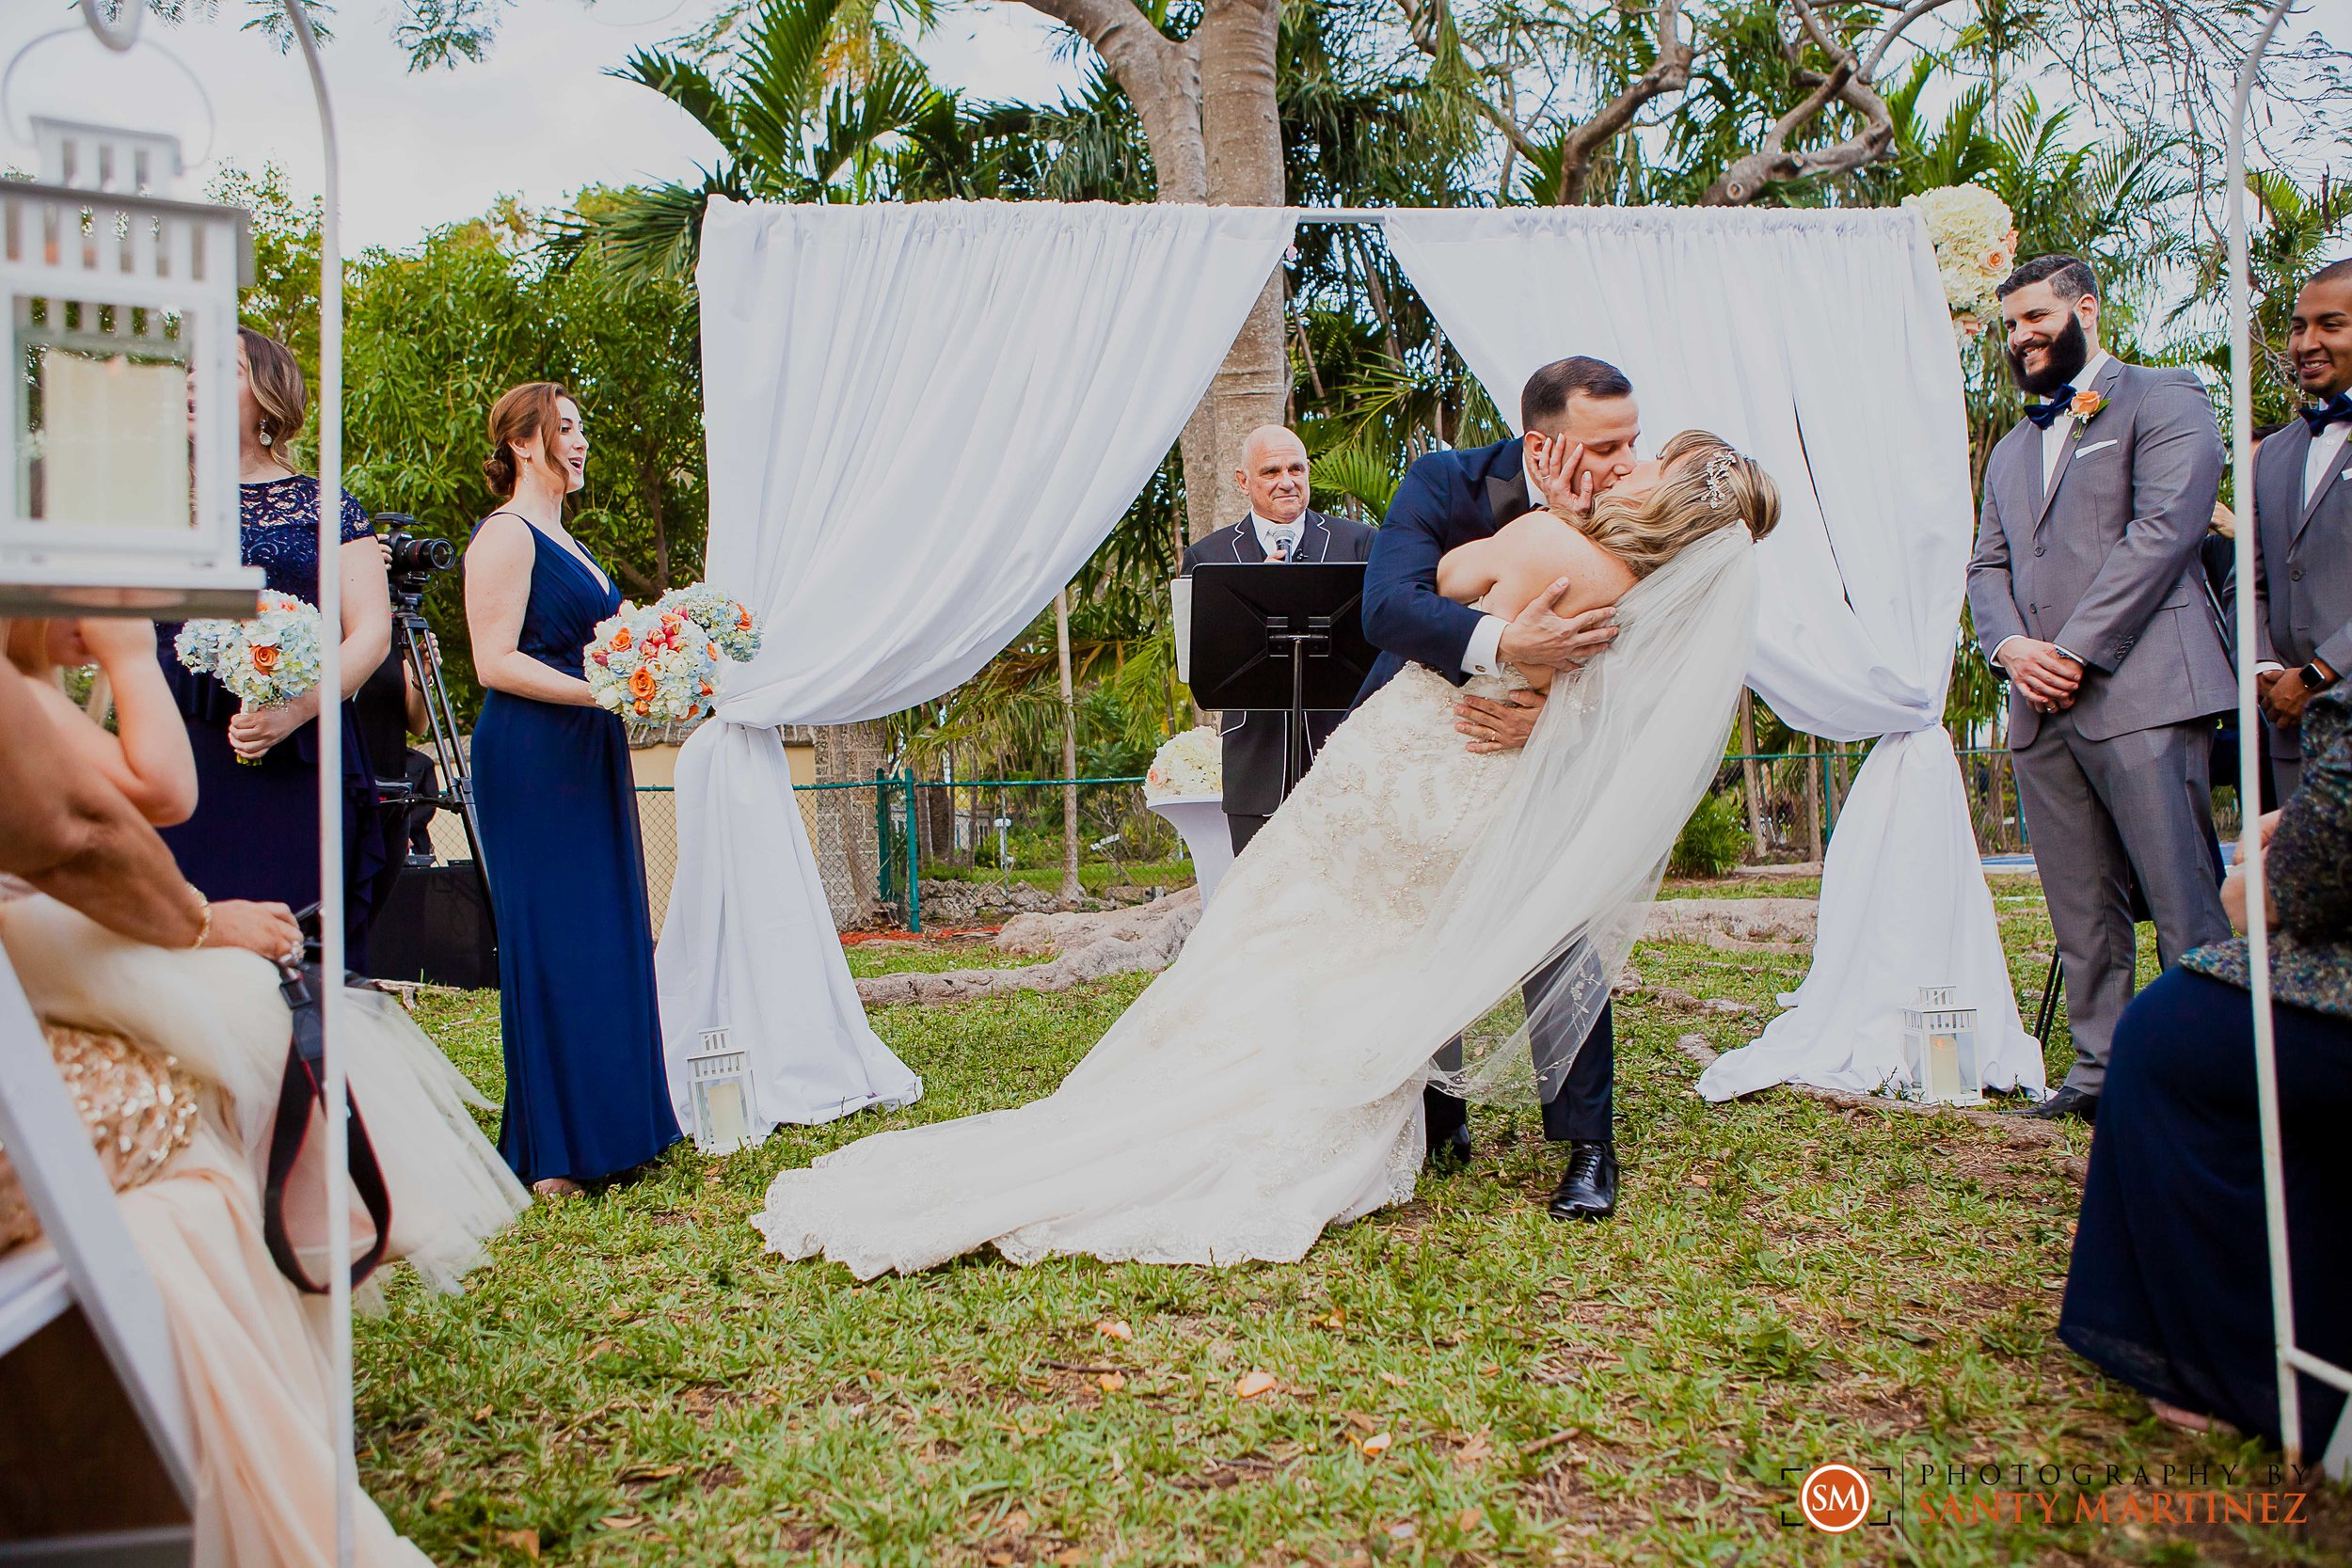 Wedding La Jolla Ballroom - Photography by Santy Martinez-34.jpg